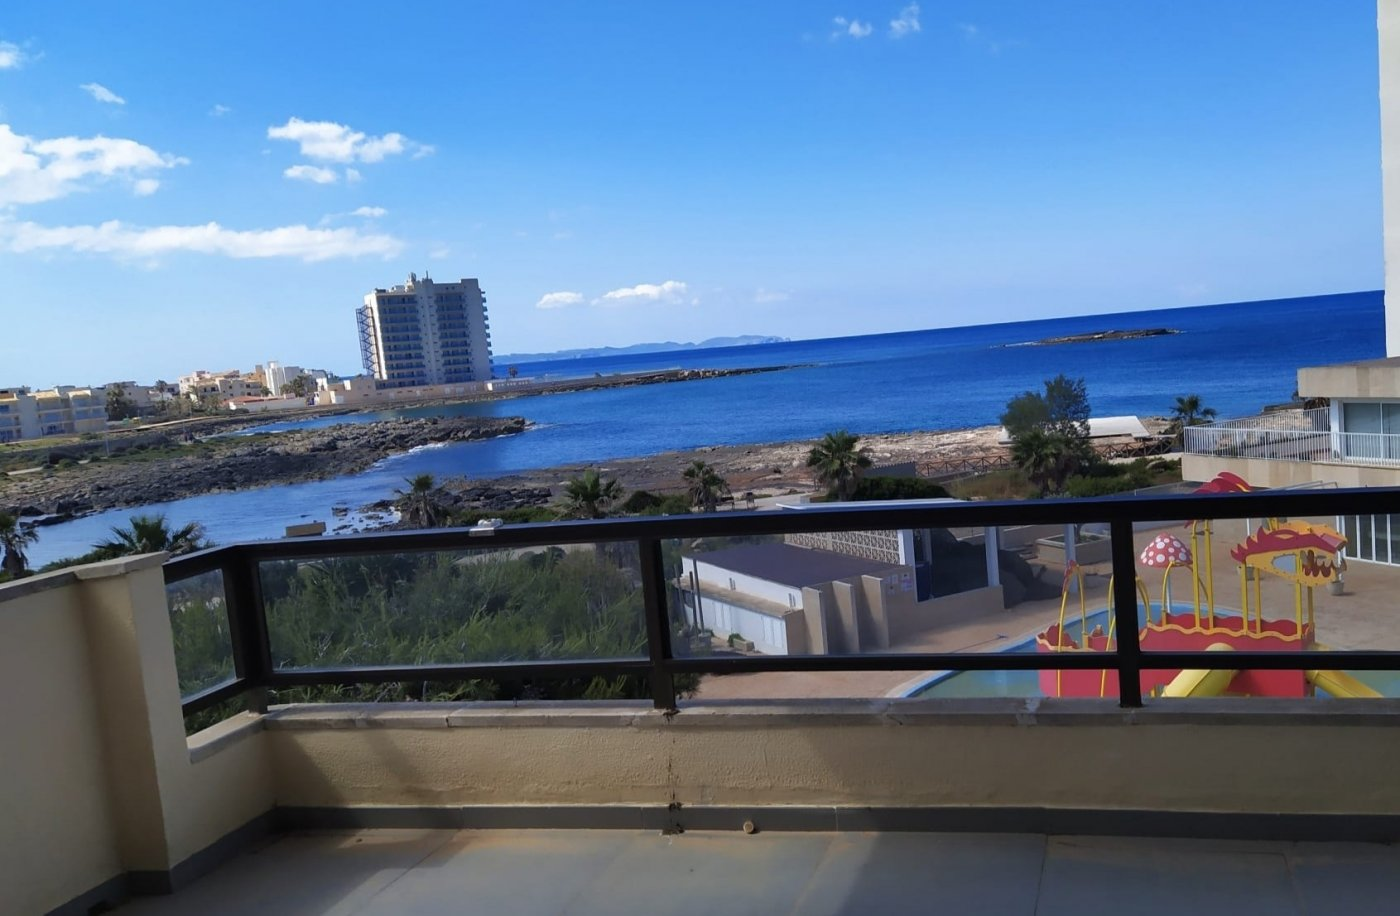 Location Appartement  Ses salines ,colònia de sant jordi. Colonia de sant jordi,  se alquila piso 110 m luminoso y tranqui